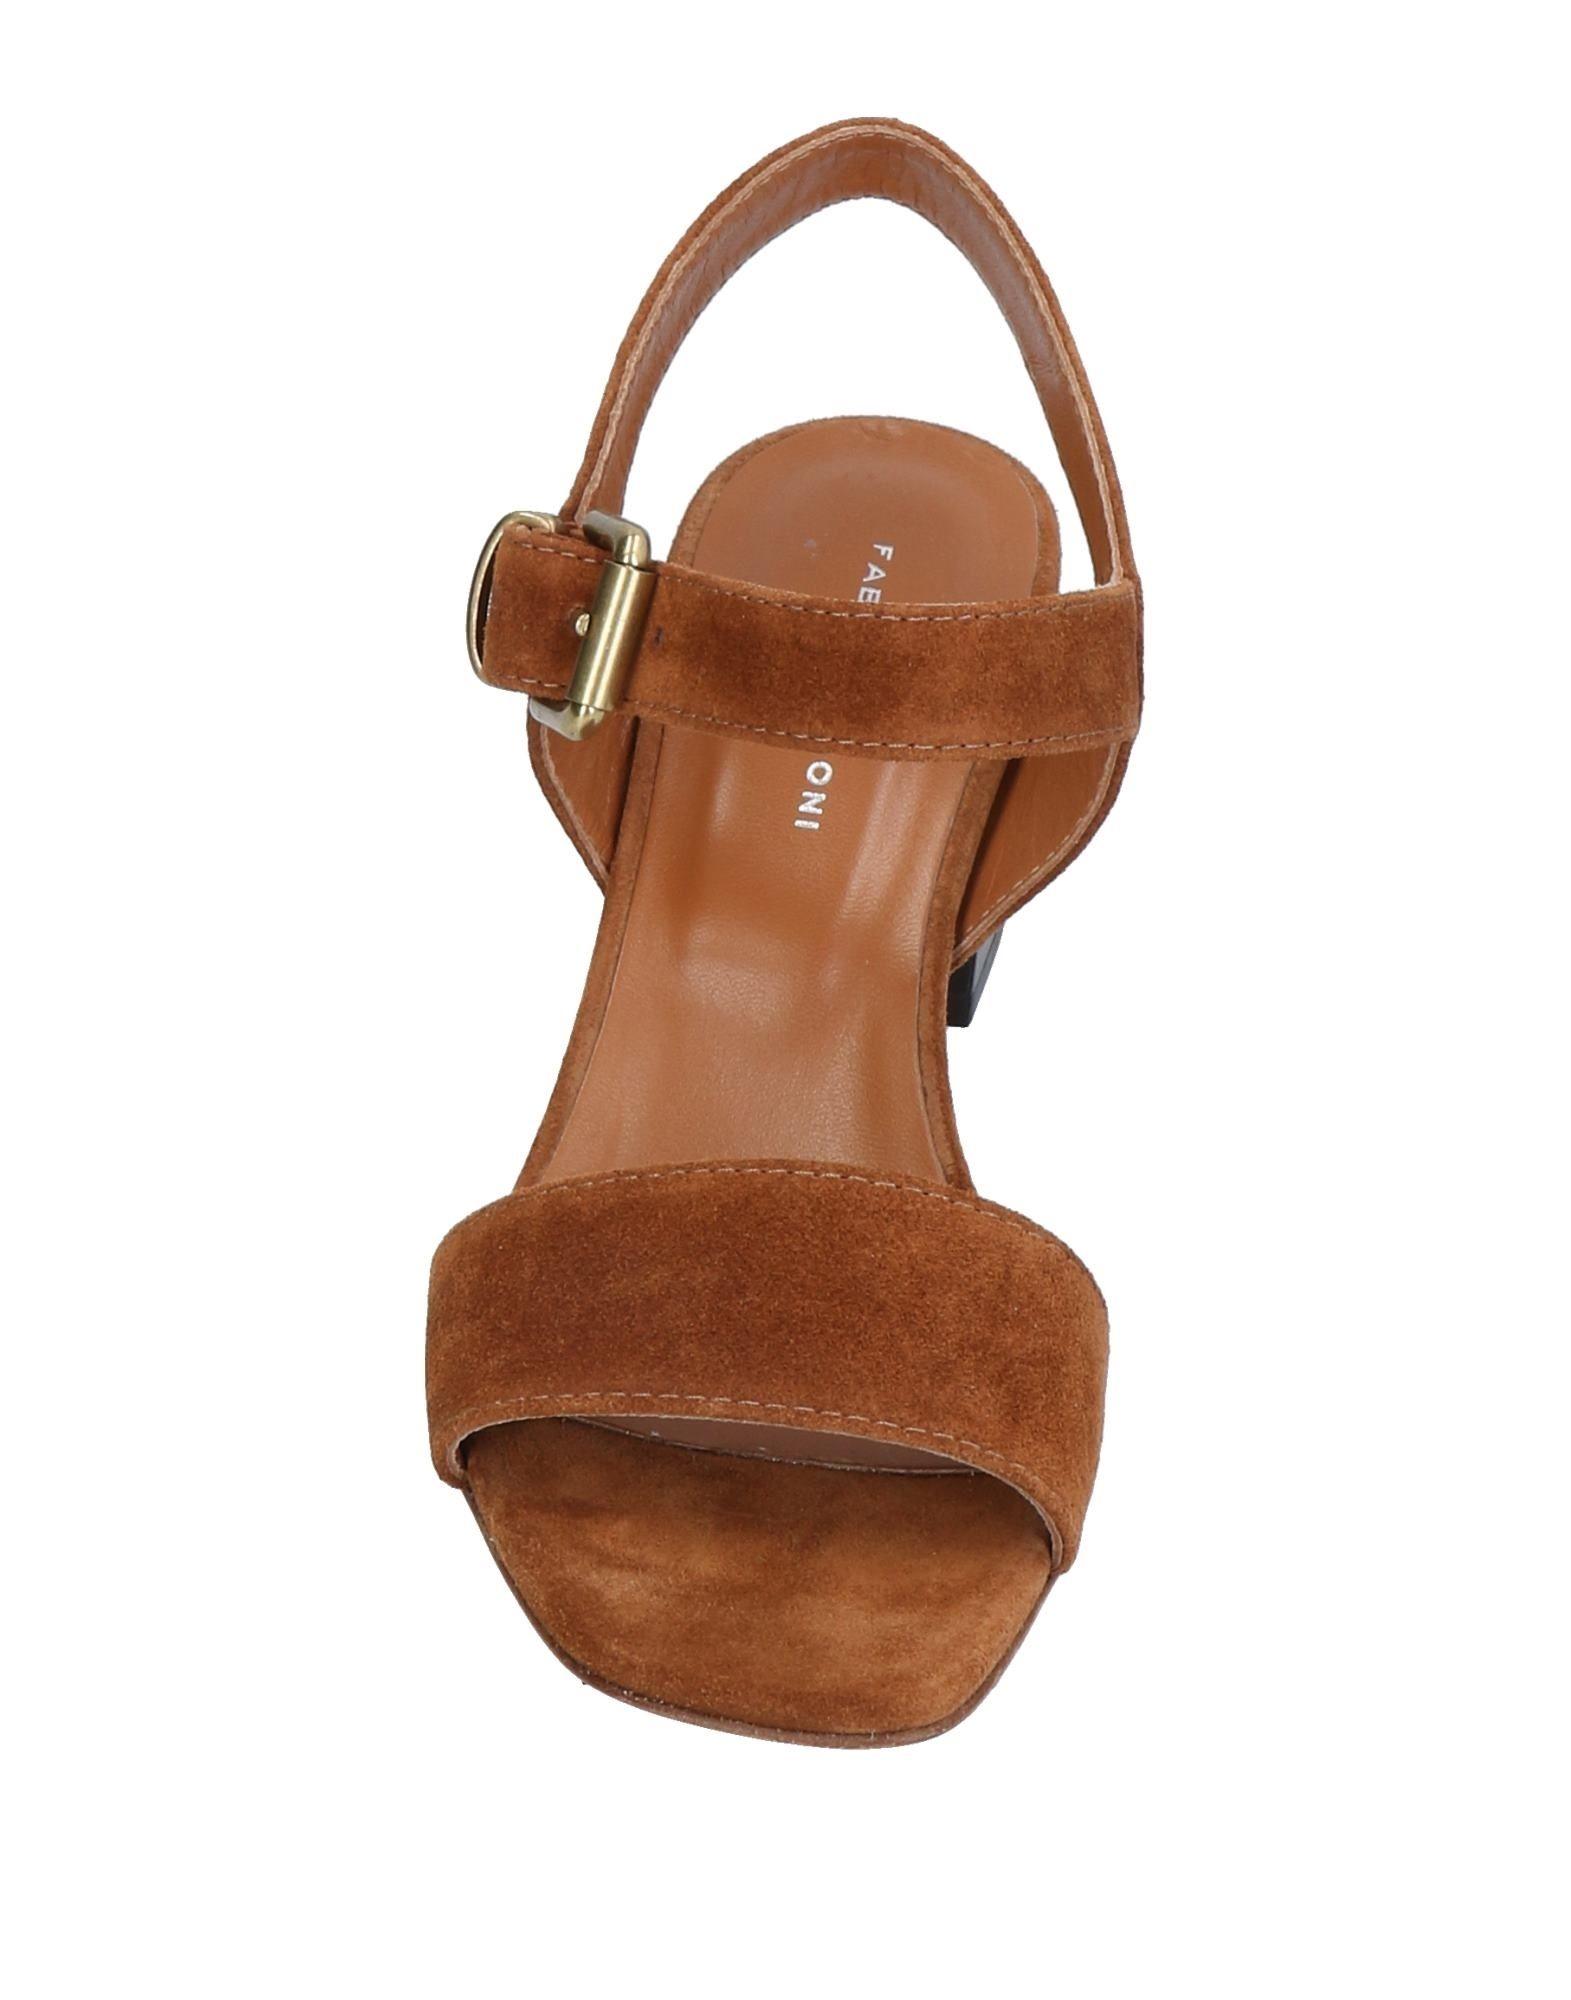 Fabio Rusconi Sandalen Damen  11391447AM Gute Qualität beliebte Schuhe